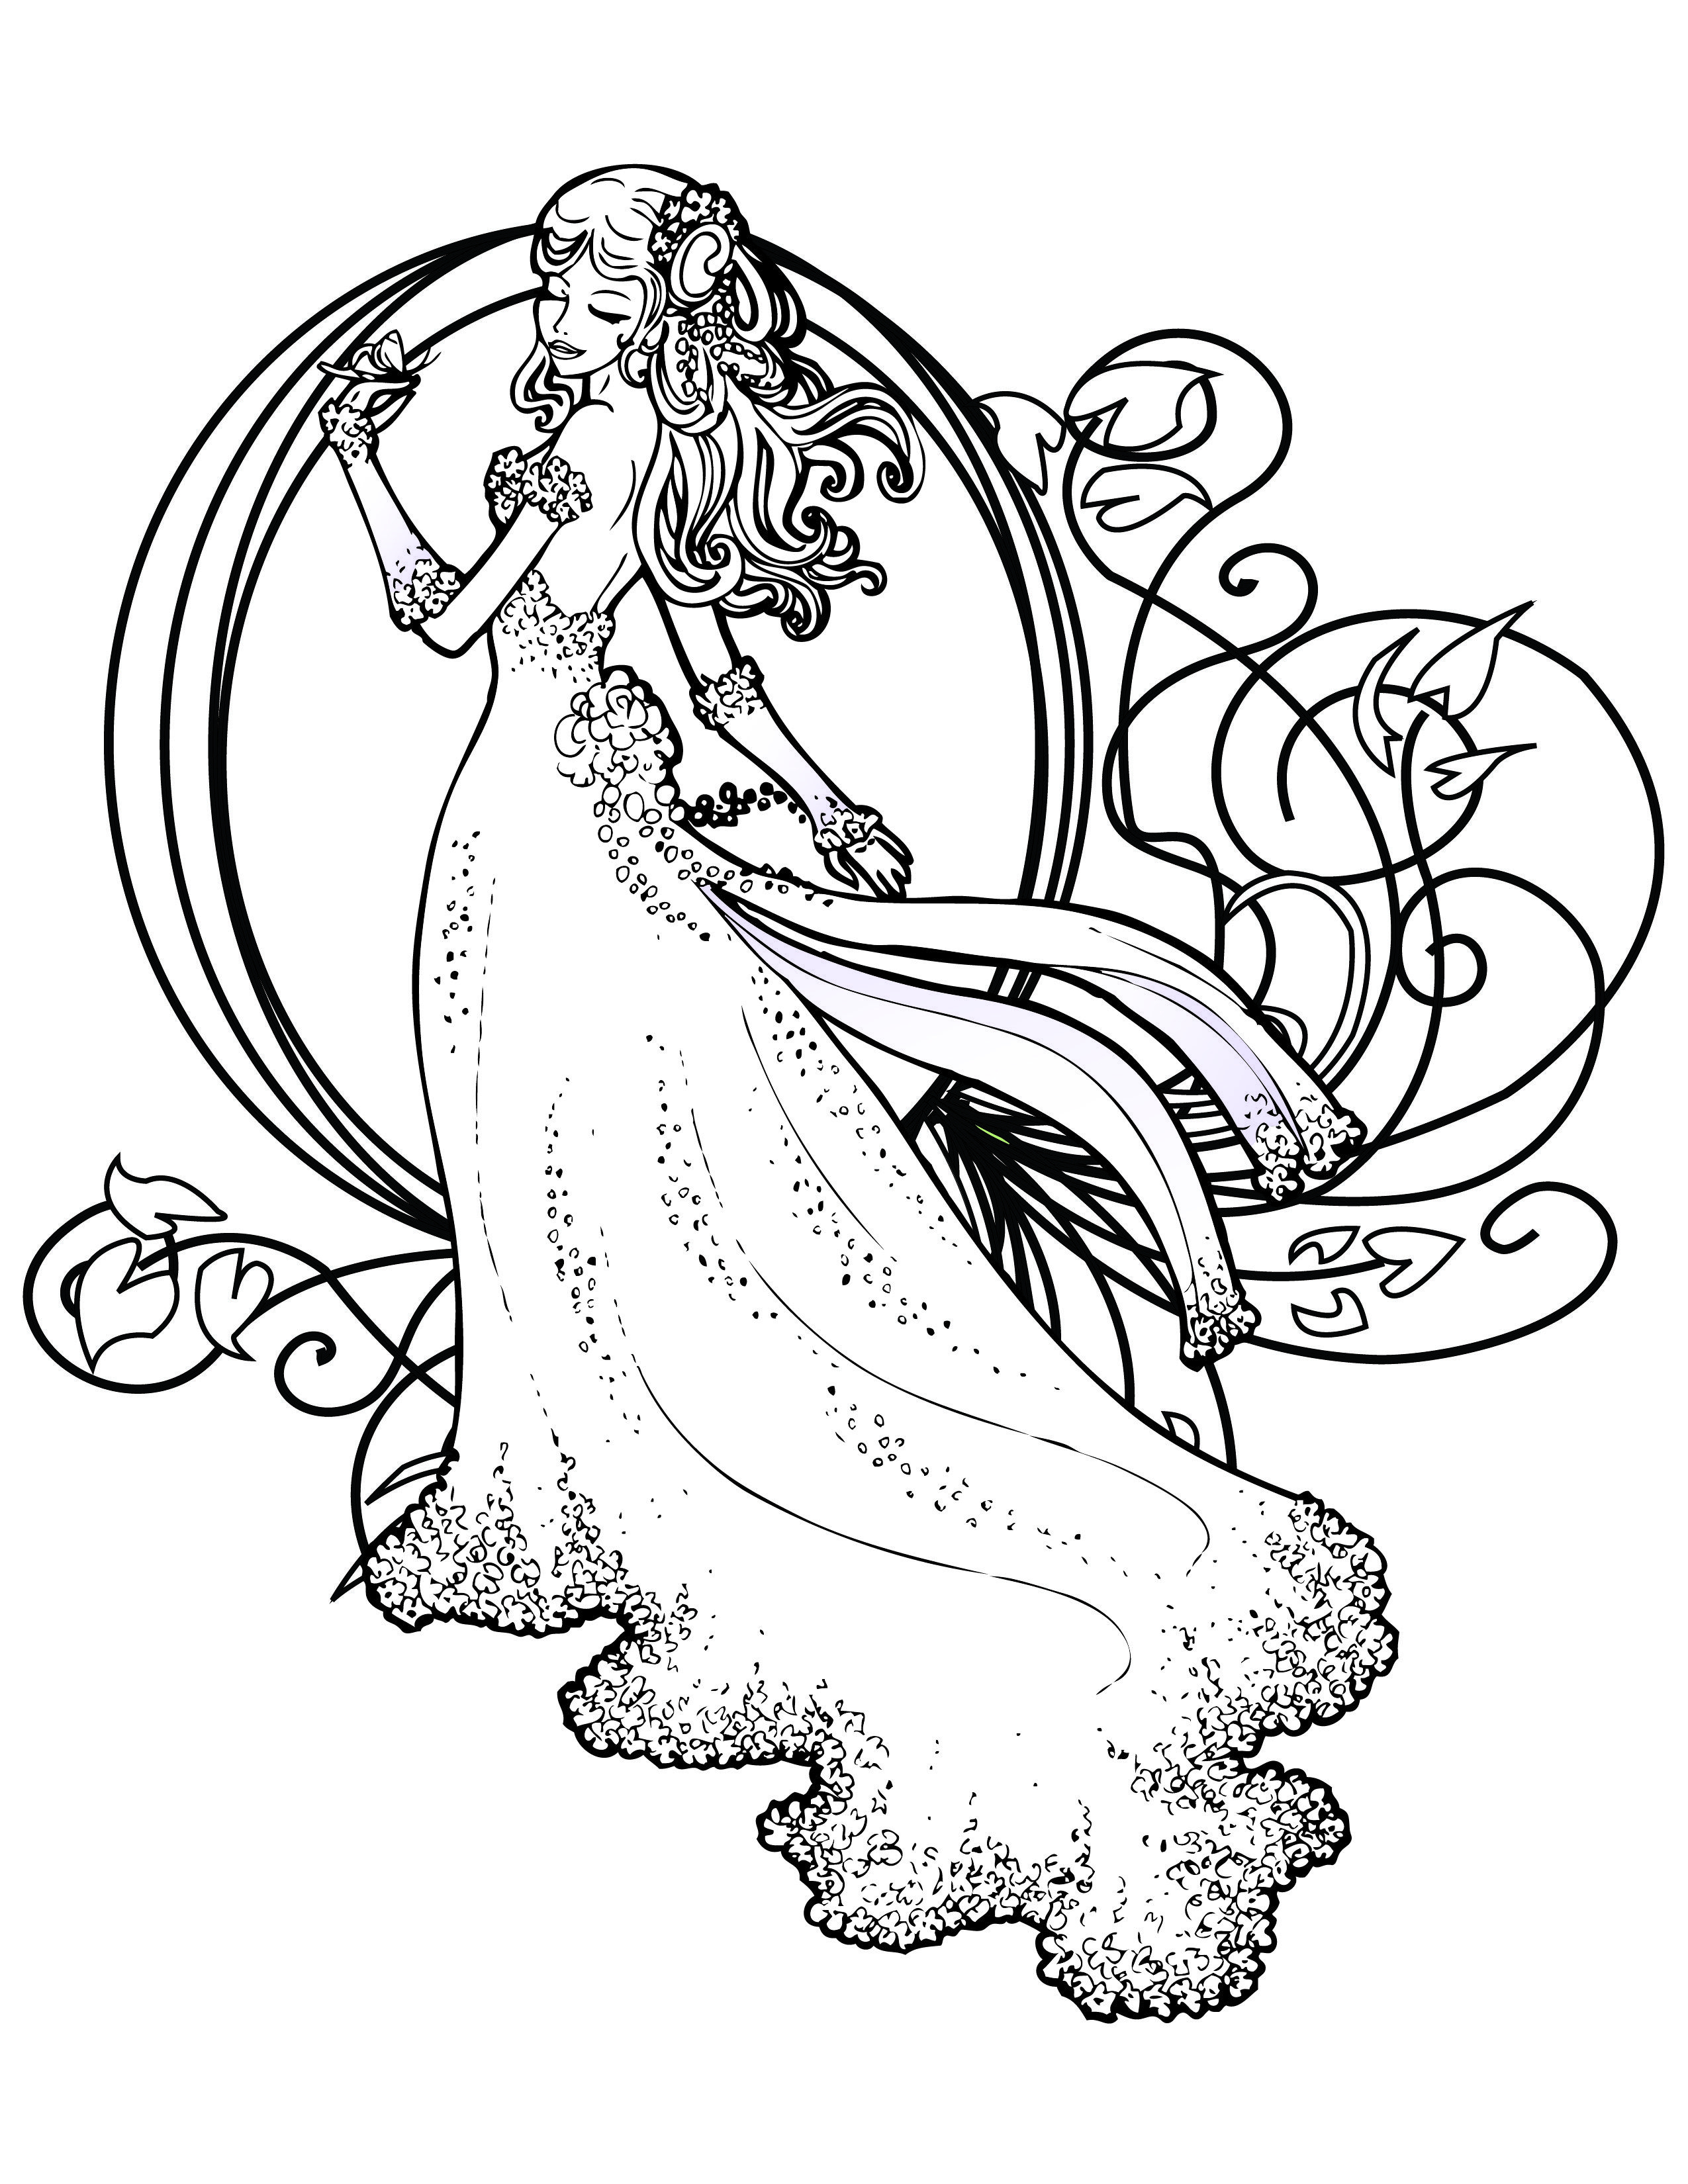 Coloriage De Princesse Disney Gratuit À Imprimer tout Coloriage A Imprimer Gratuit